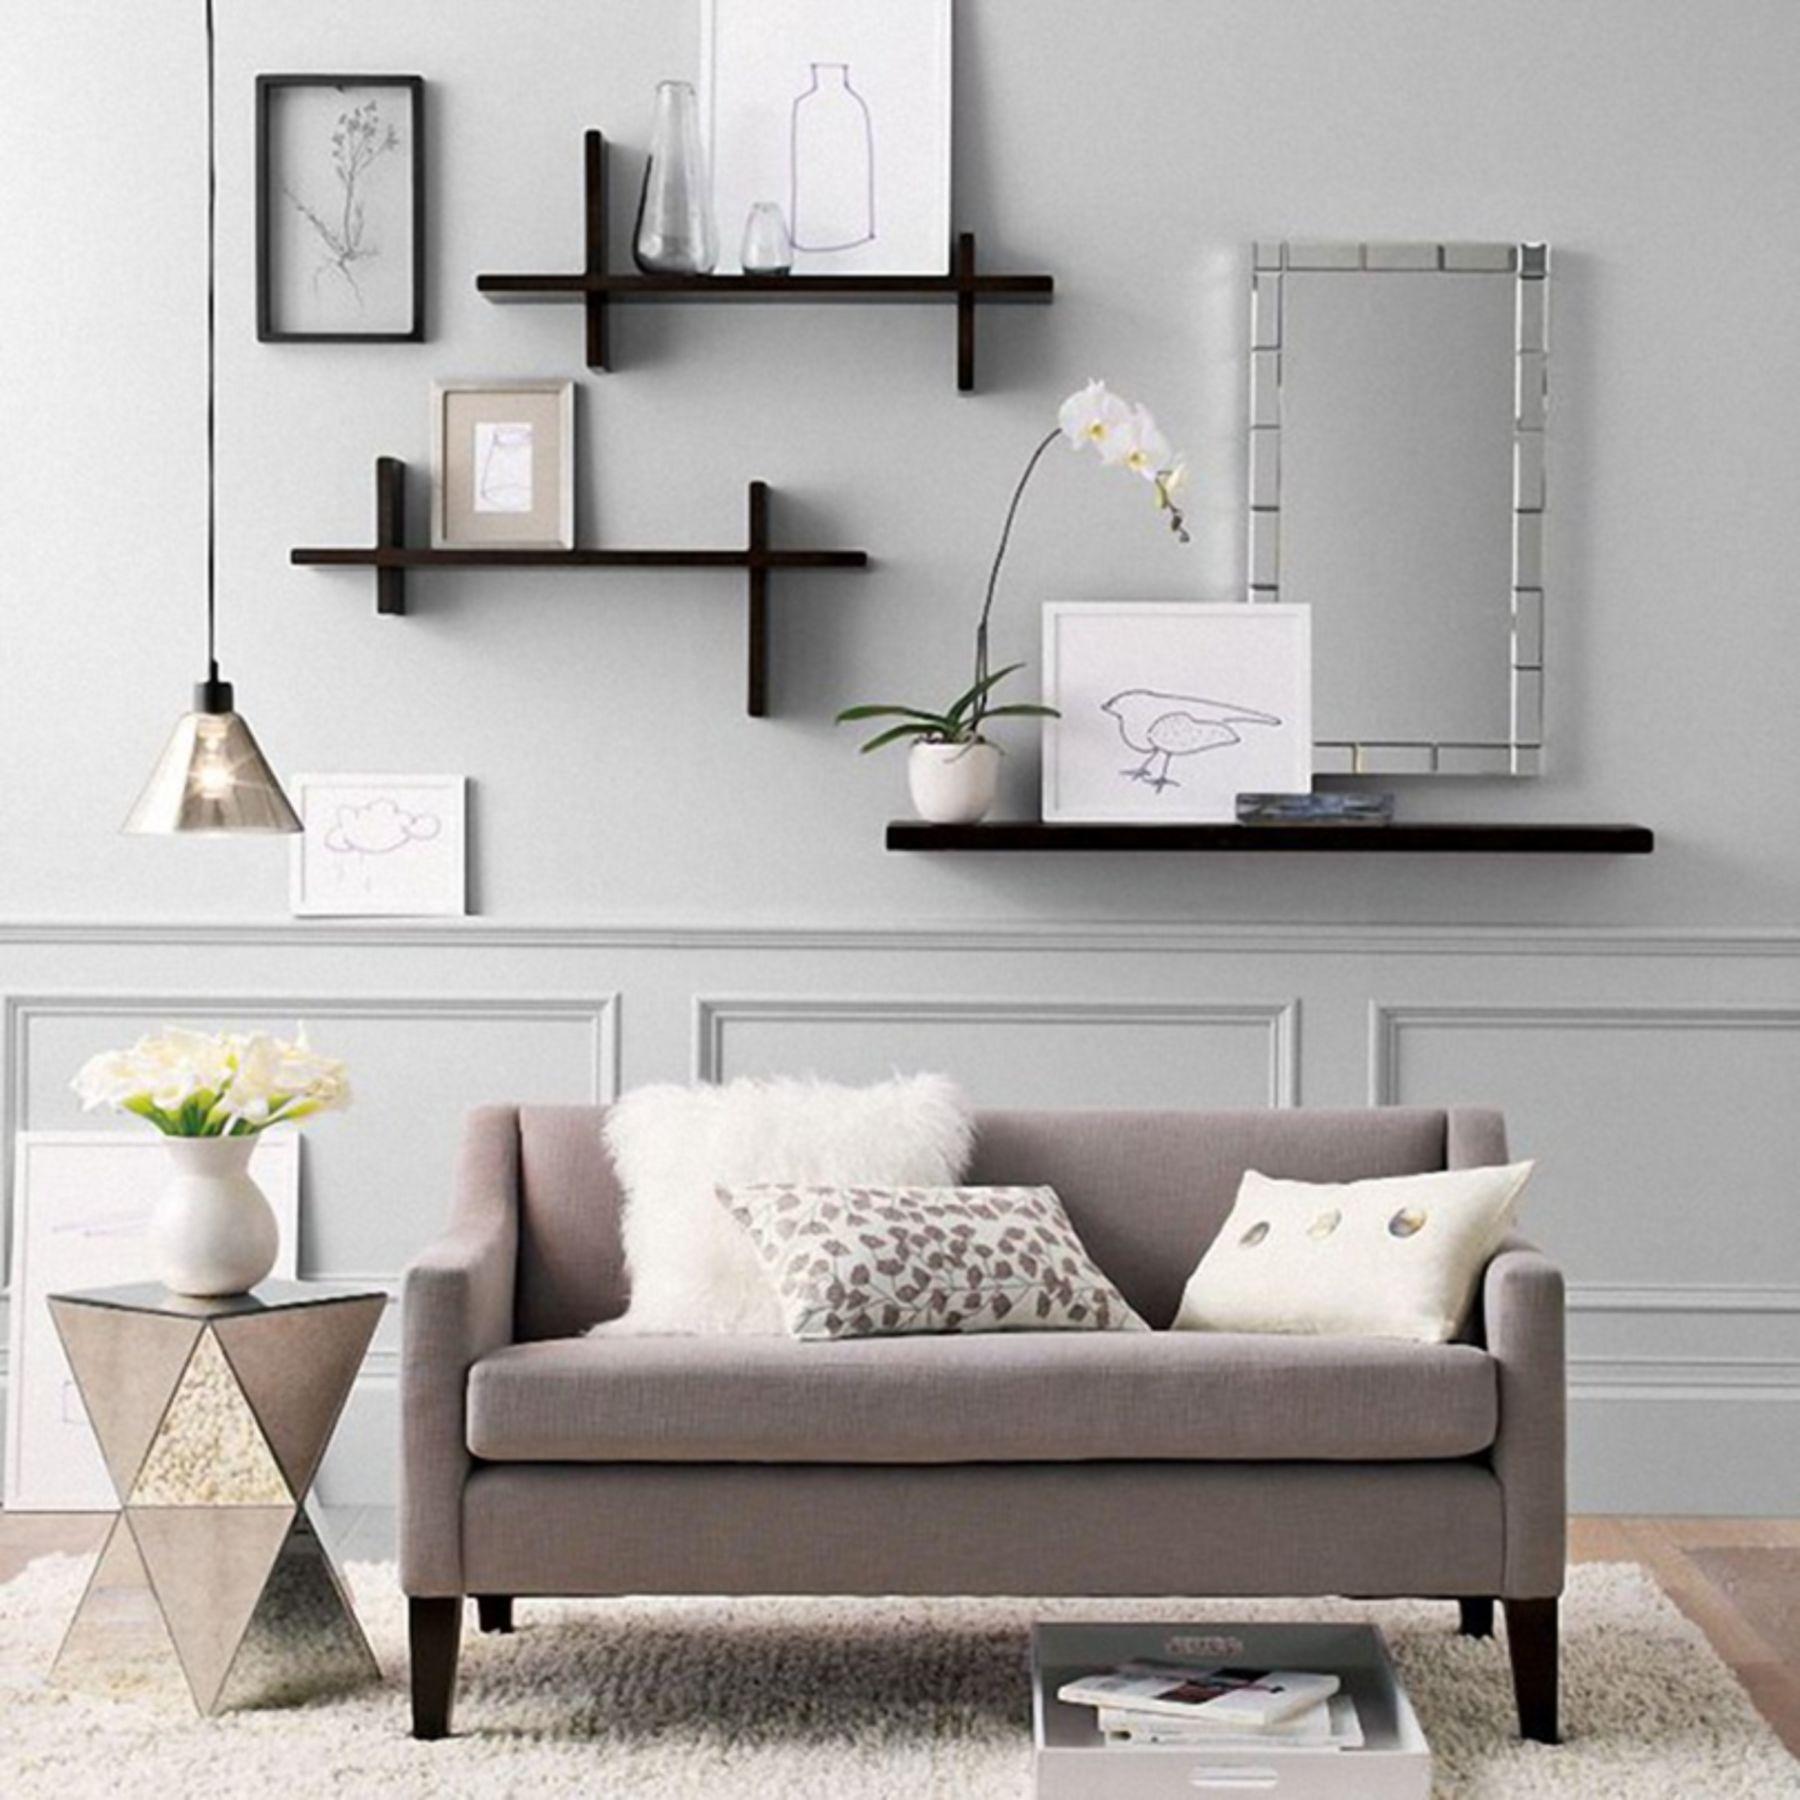 20 wonderful floating shelves for alternative decorations